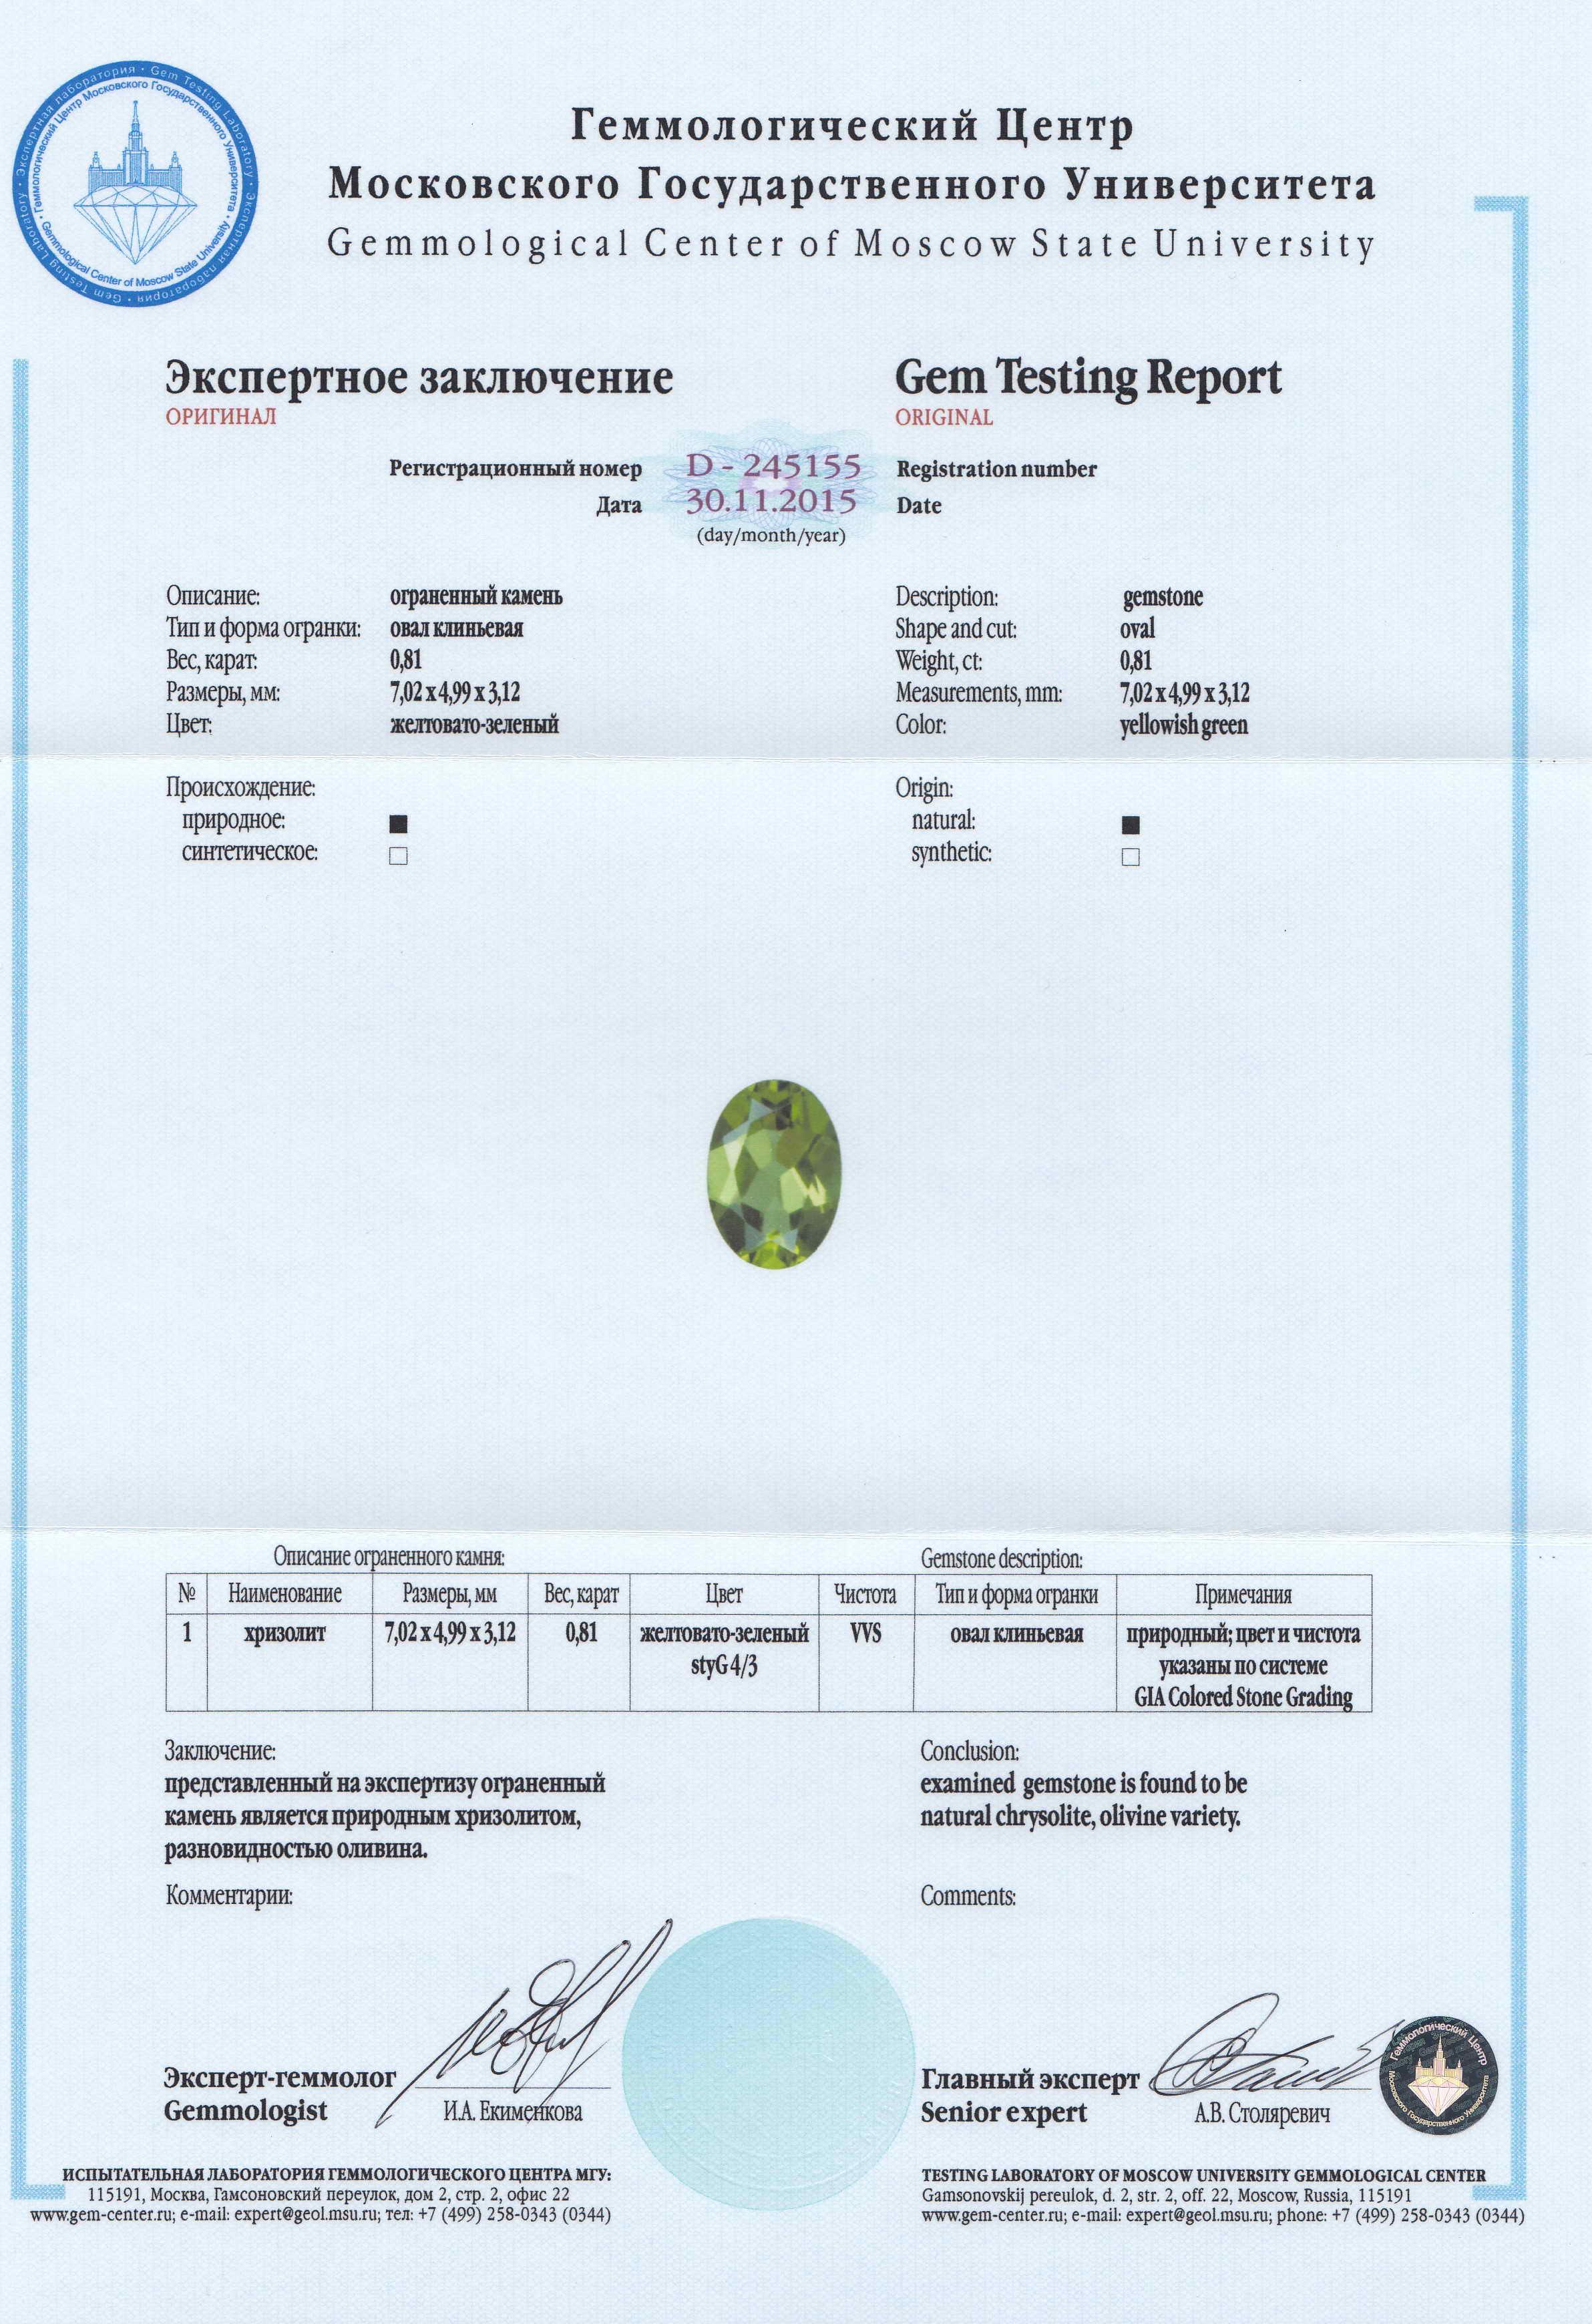 https://mineralmarket.ru/img/certificate/134/134.jpg